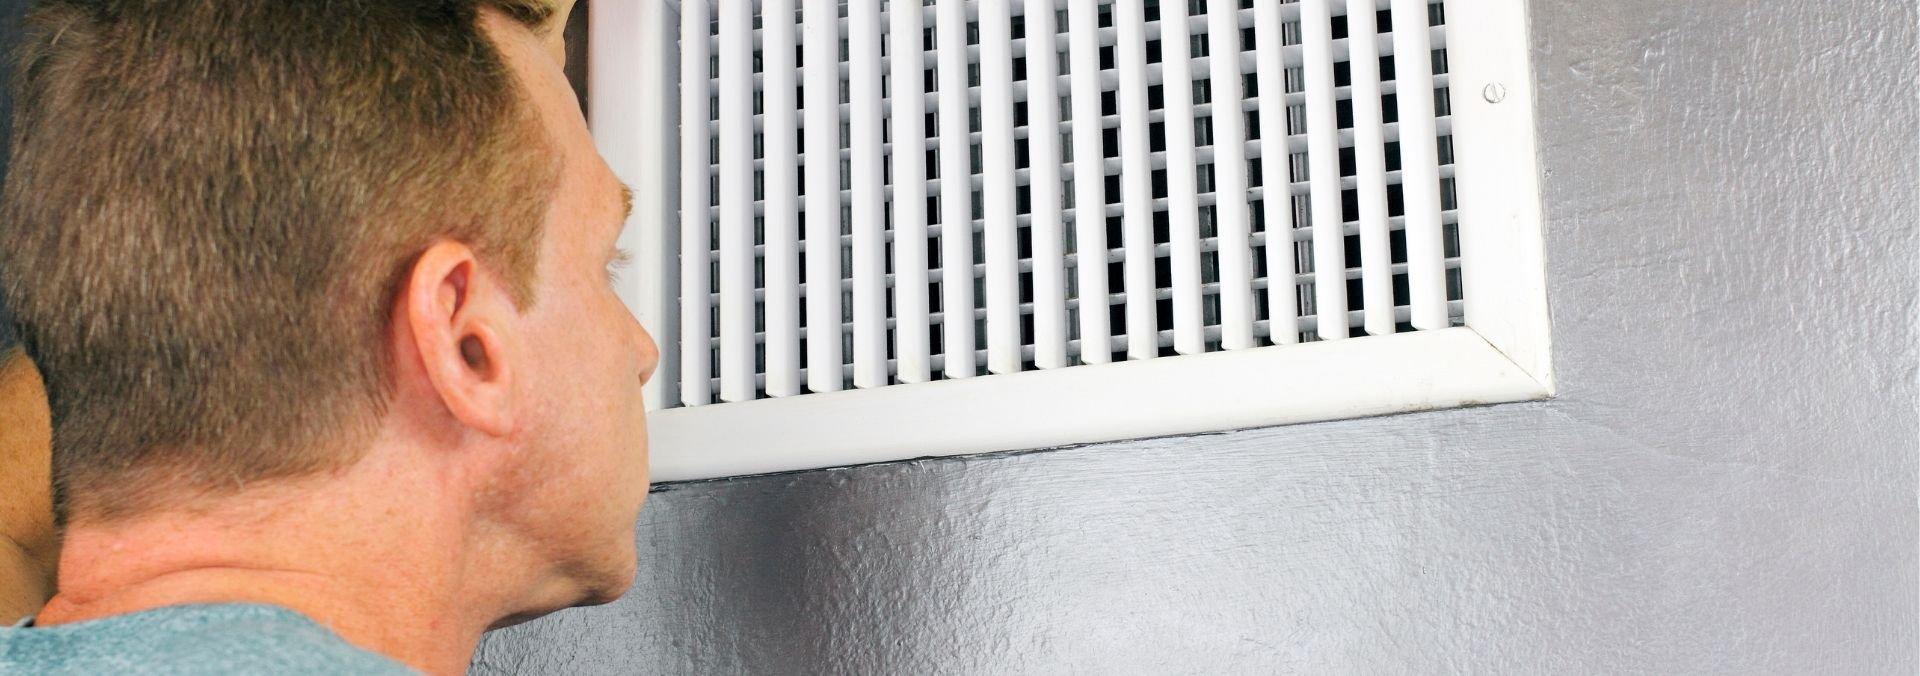 HVAC energy inspection